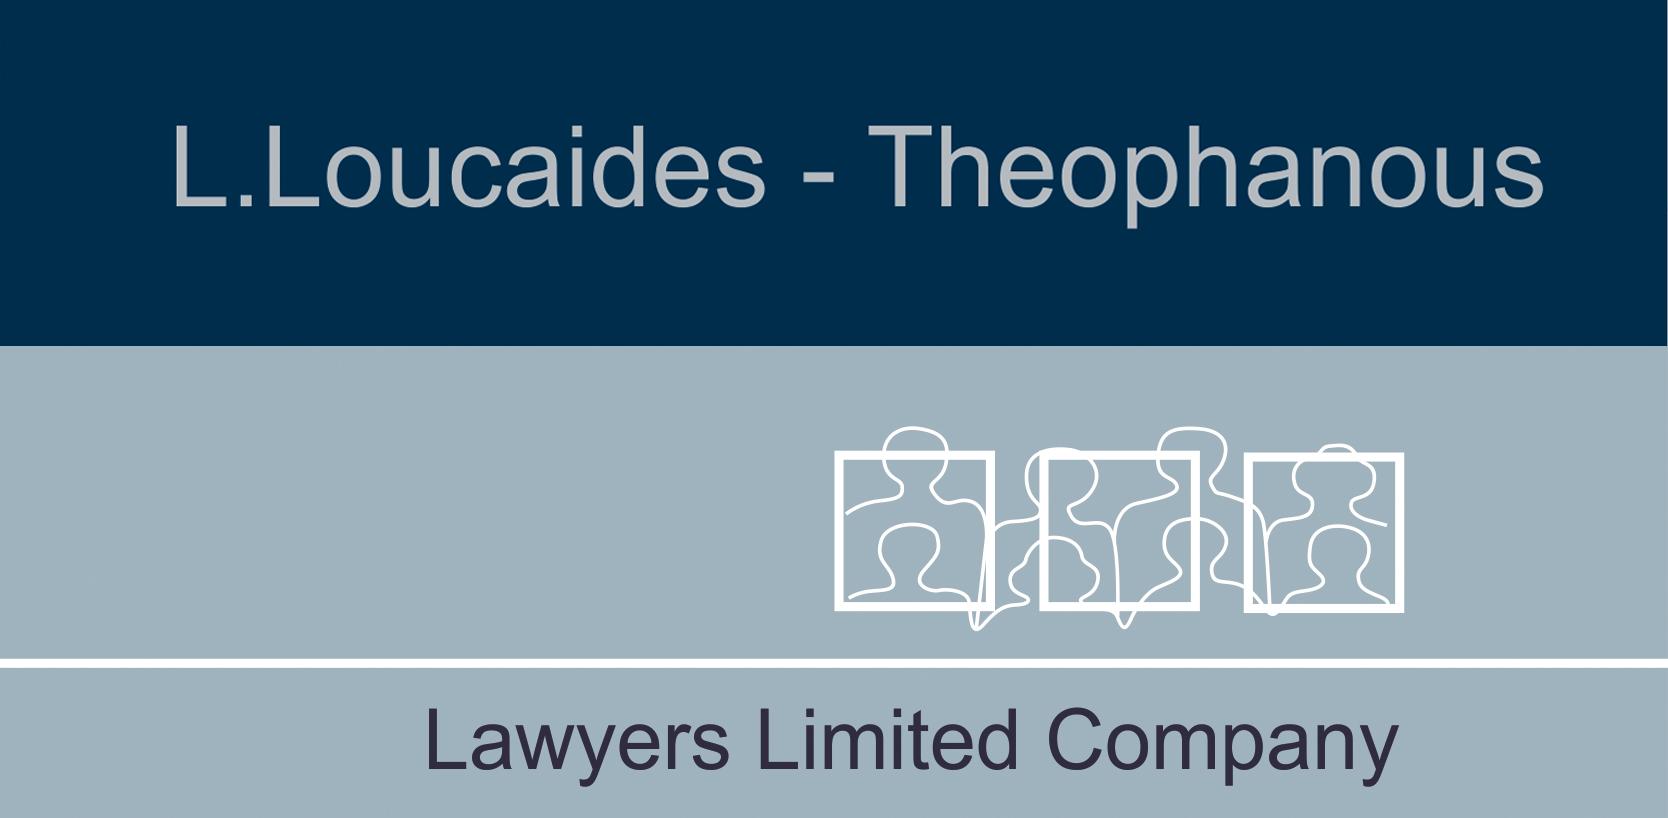 L Loucaides heofanous LLC logo